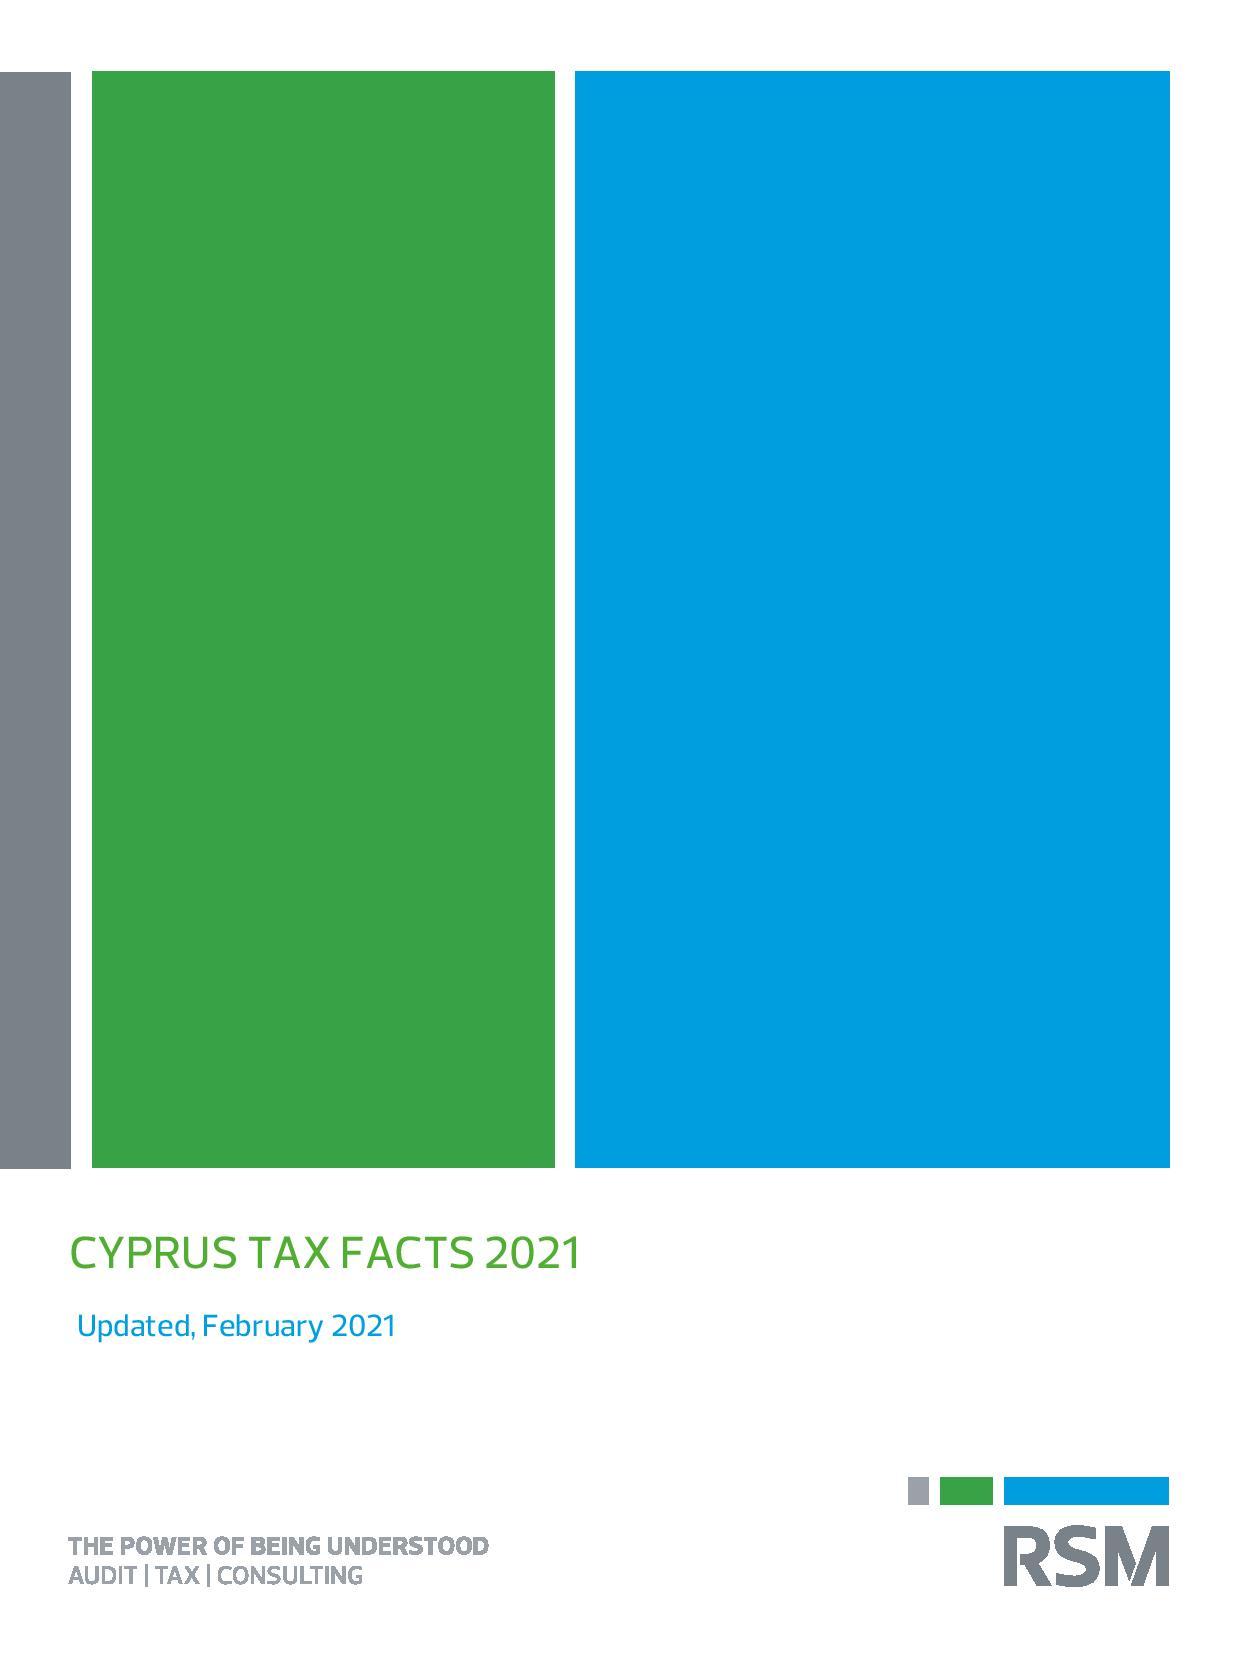 RSM: Cyprus Tax Facts 2021